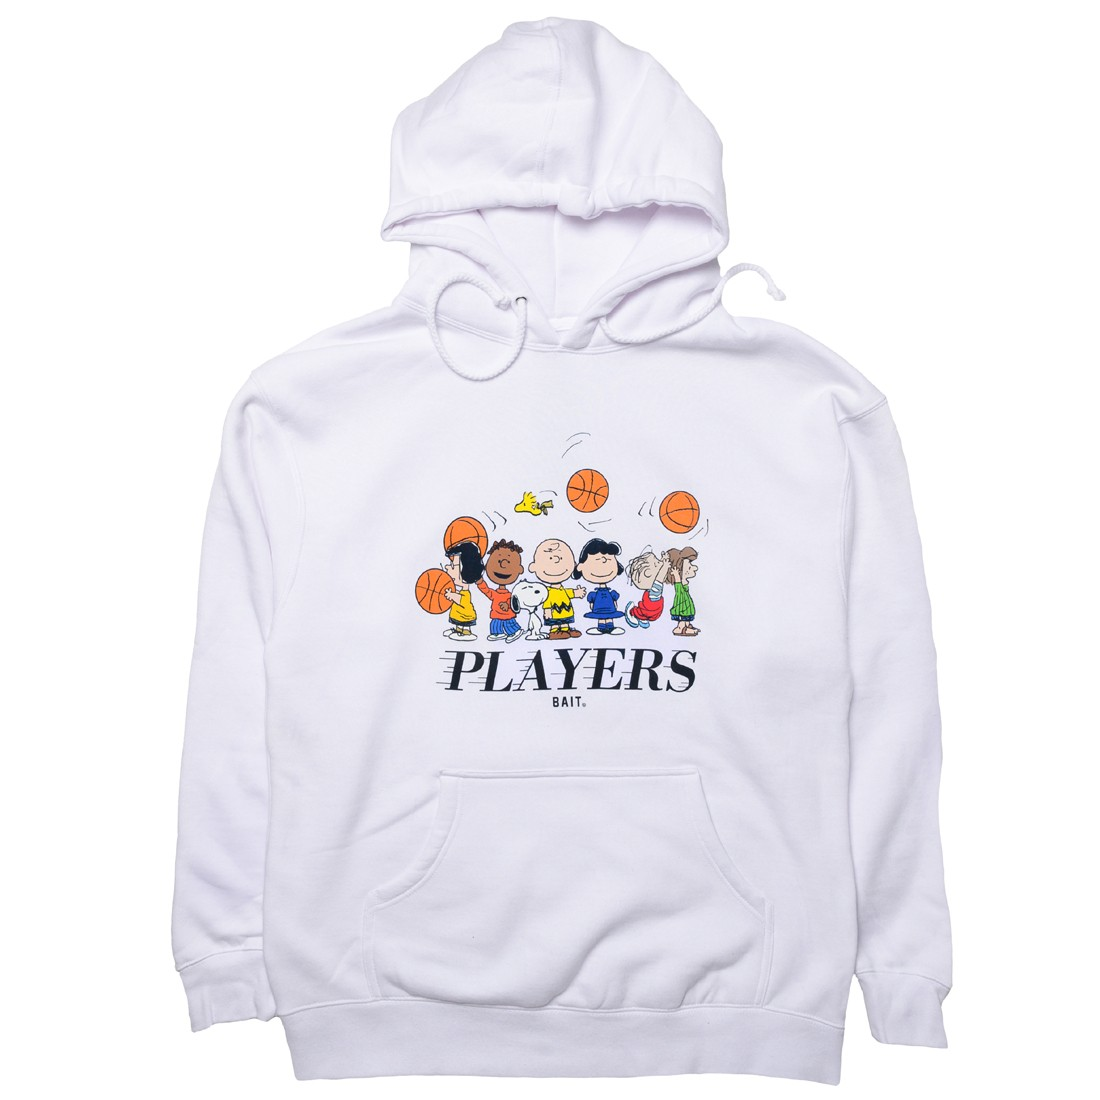 BAIT x Snoopy Men Players Hoody (white)